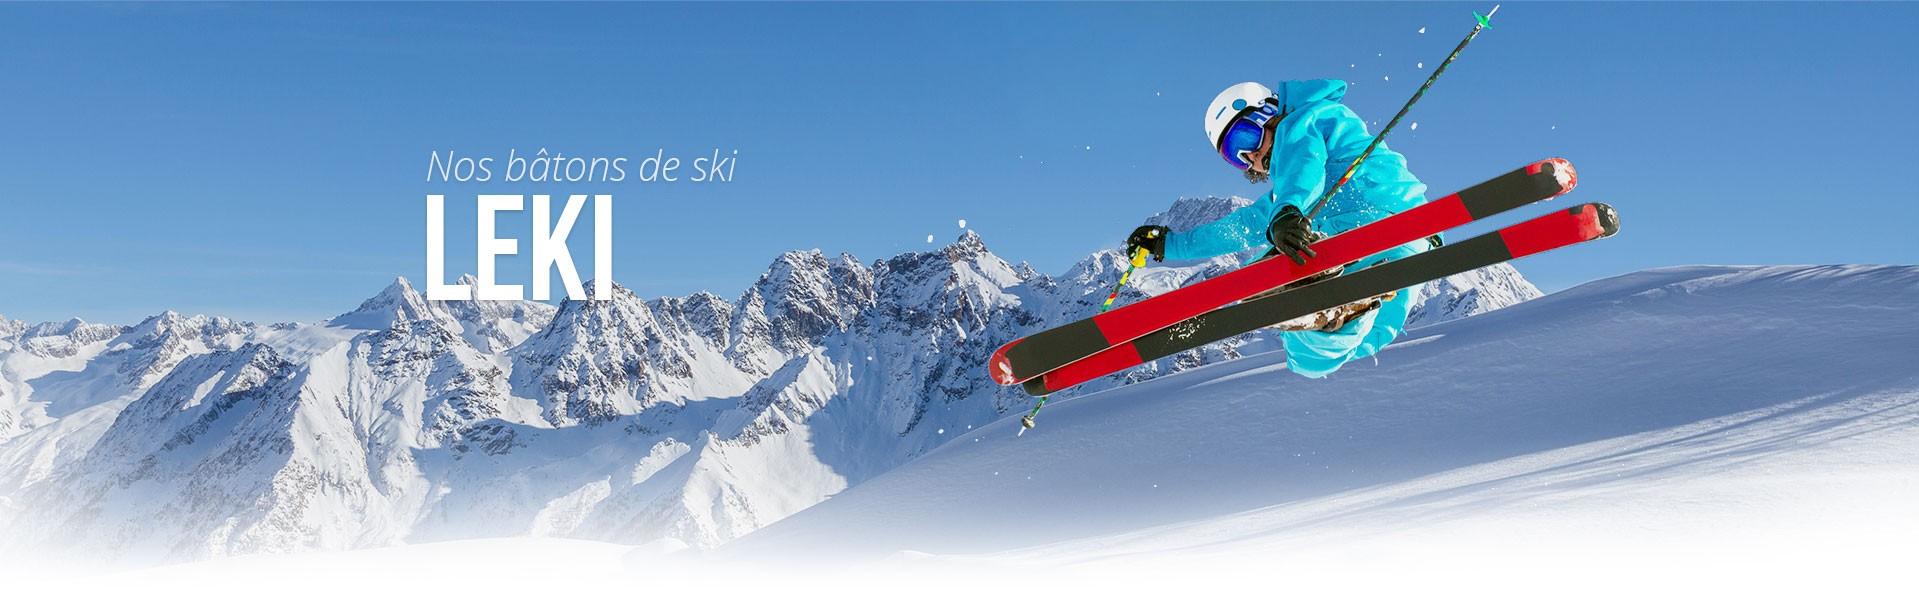 Bâtons de ski de piste Léki